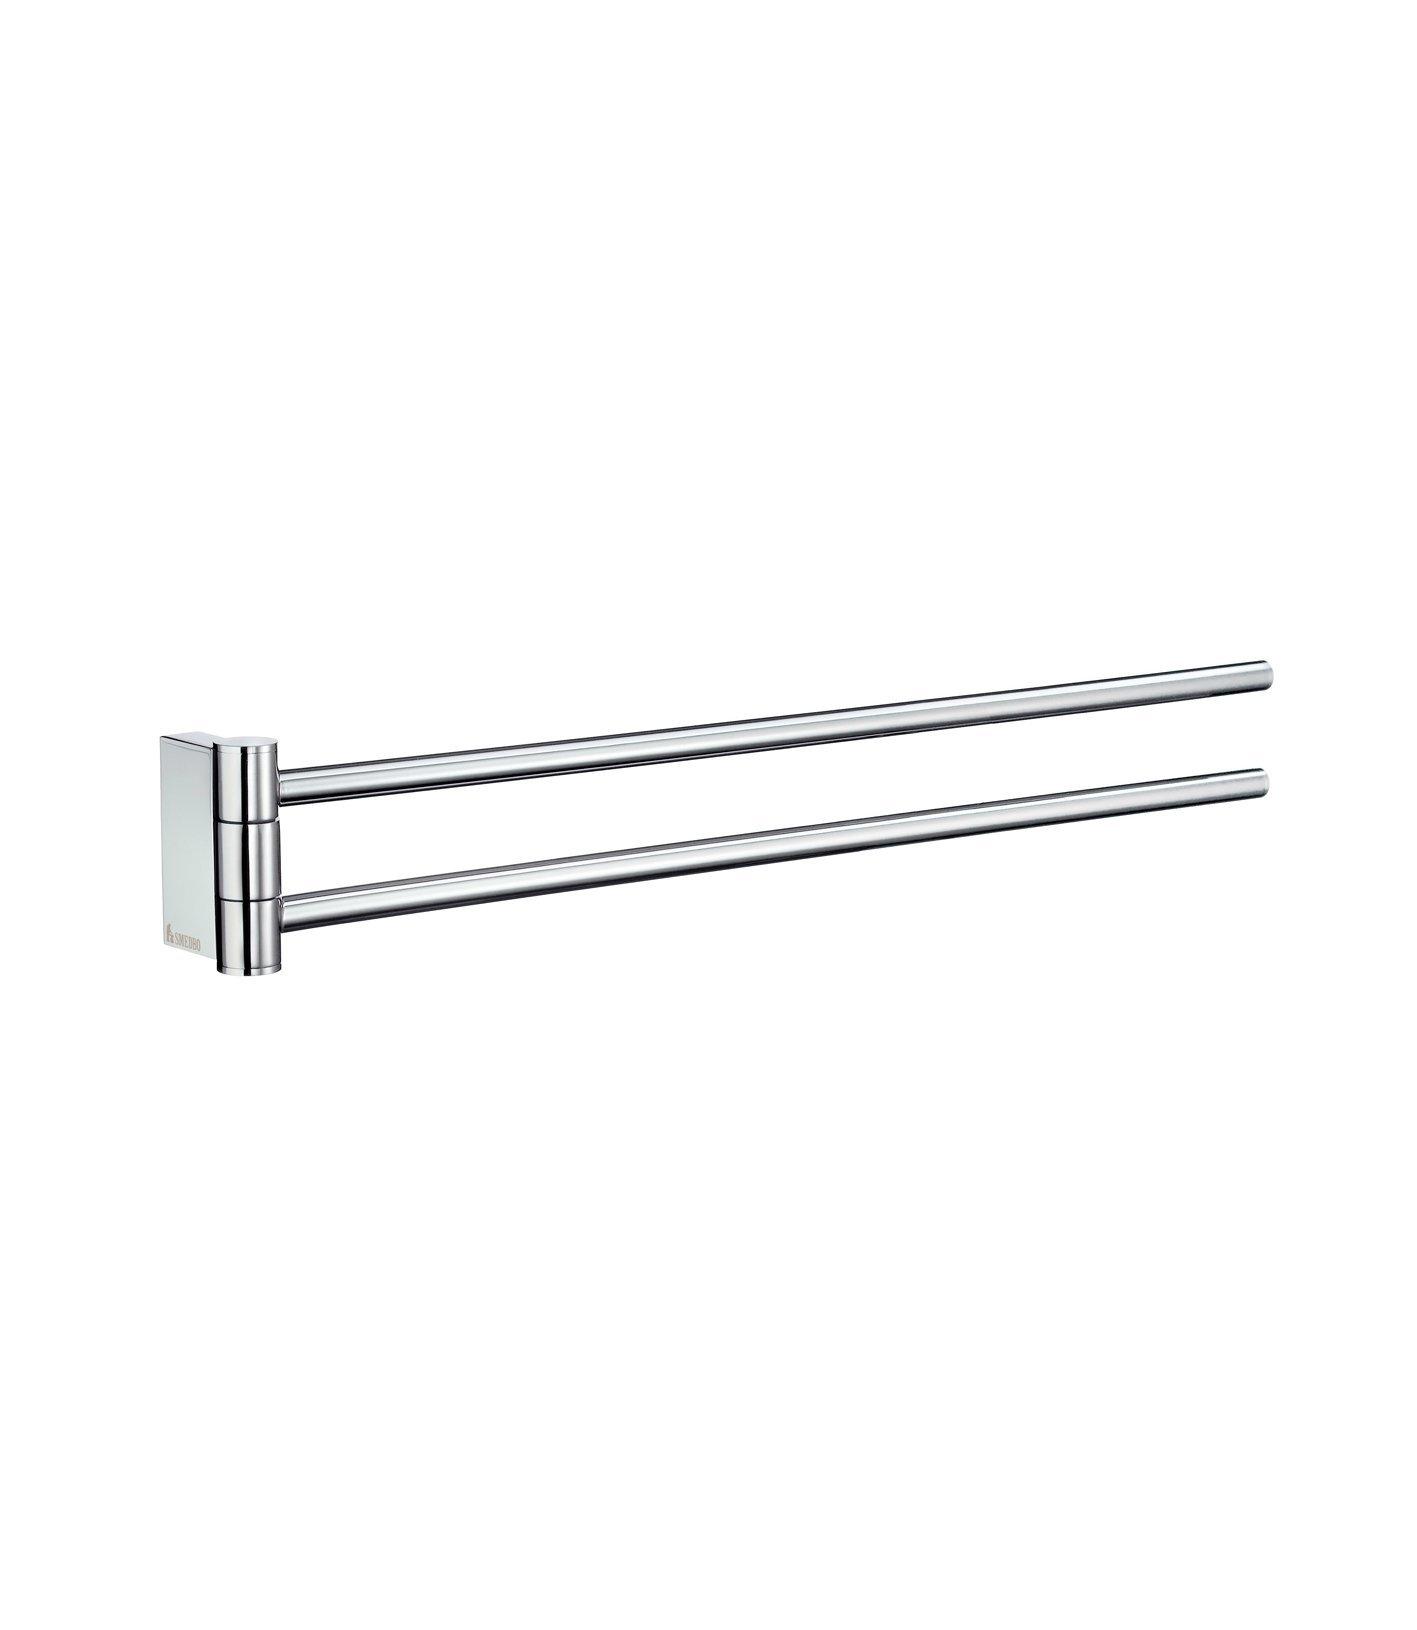 Smedbo SME_AK326 Towel Rail Swing-Arm, Polished Chrome